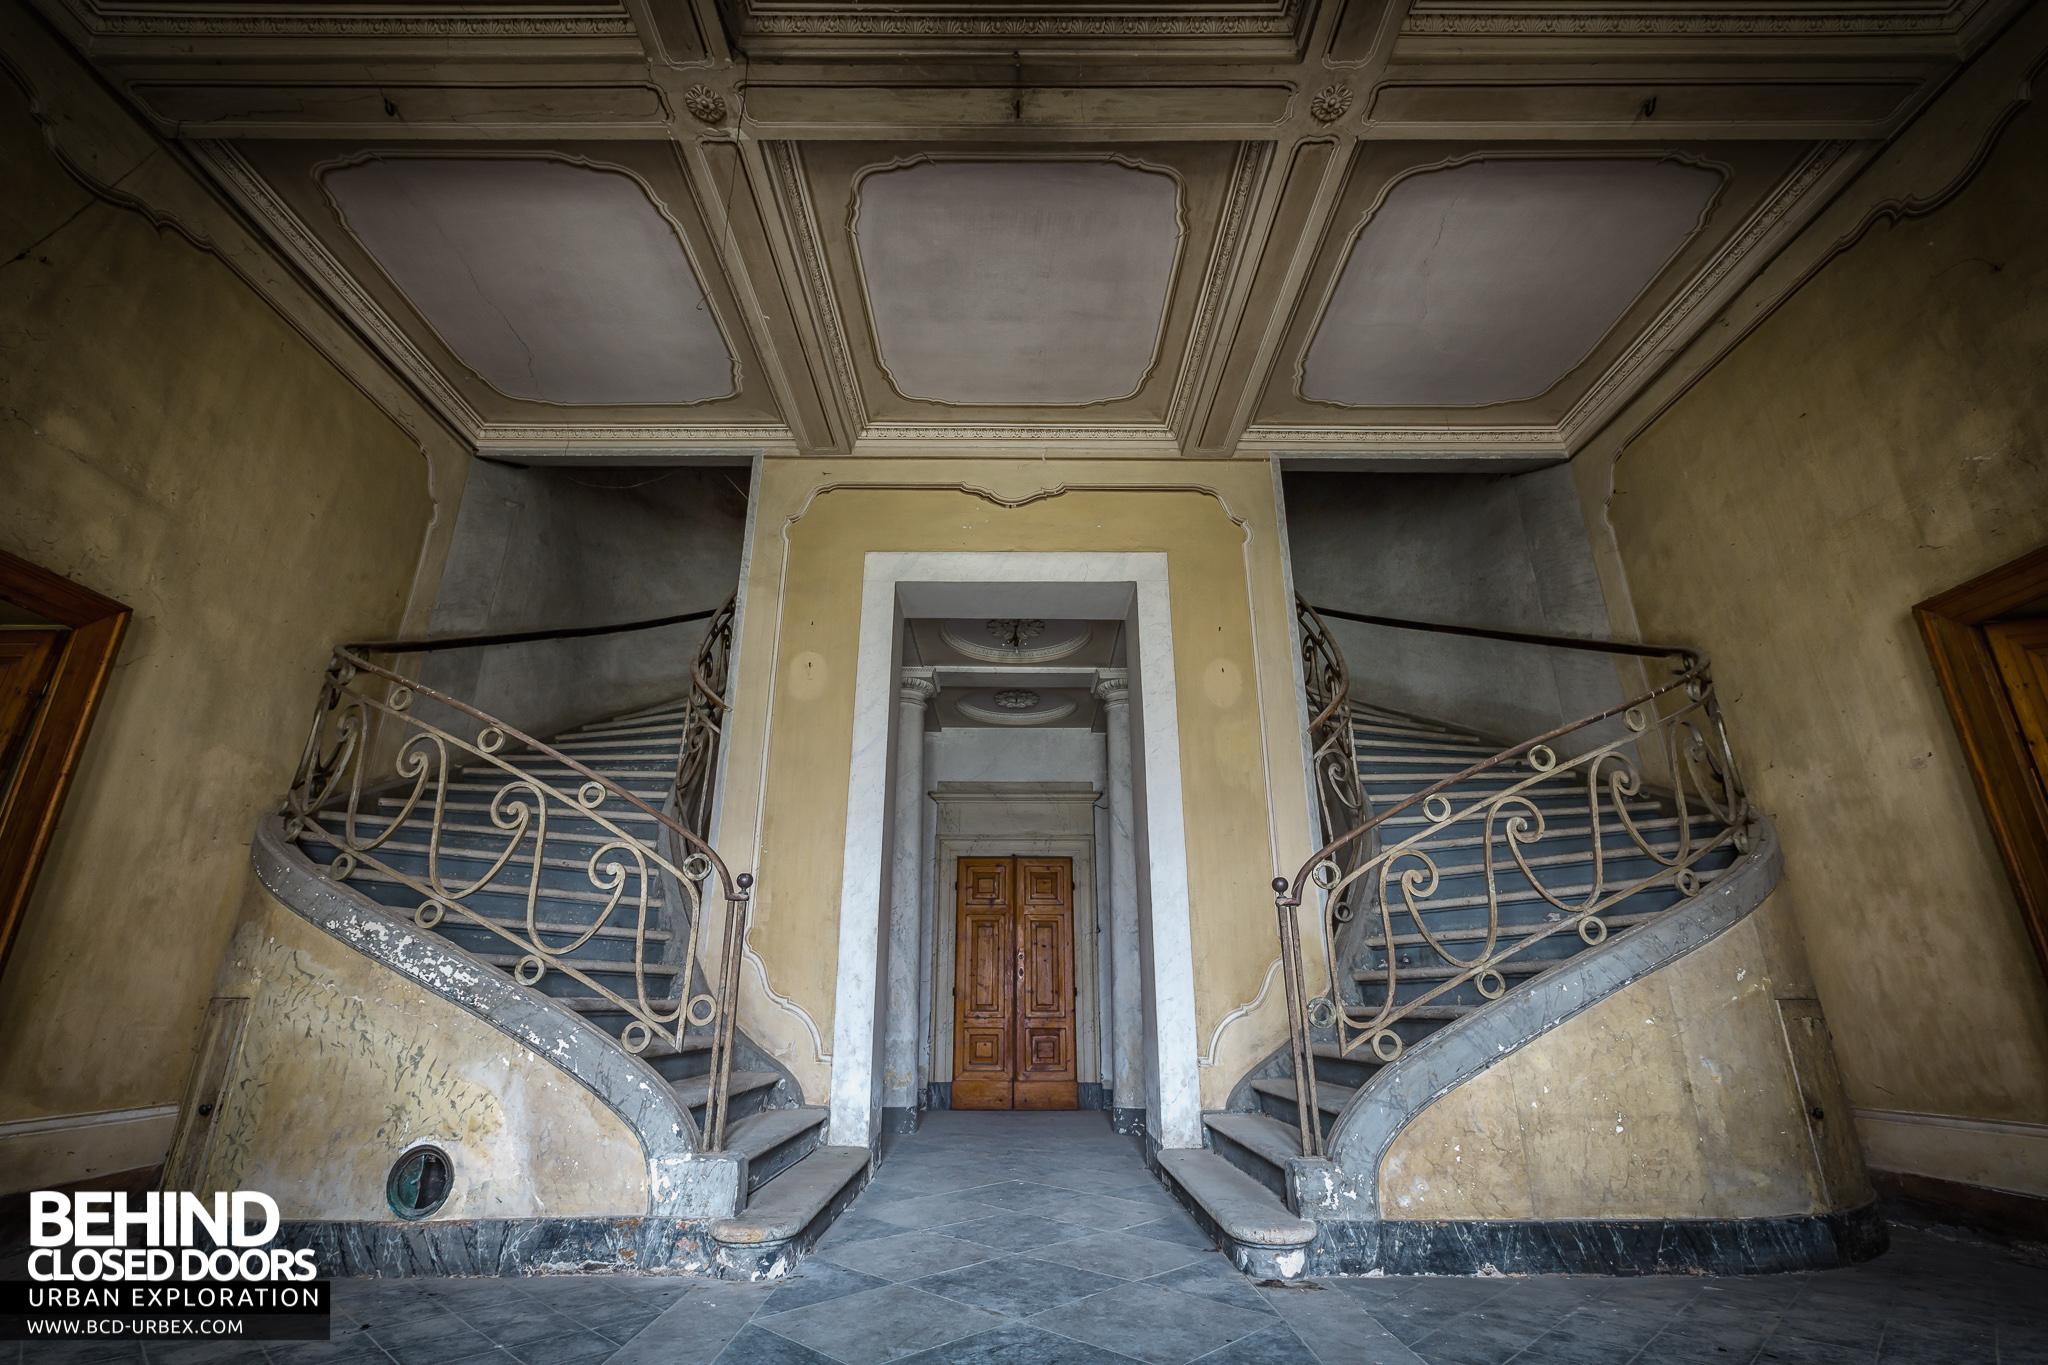 Palace Casino Italy 187 Urbex Behind Closed Doors Urban